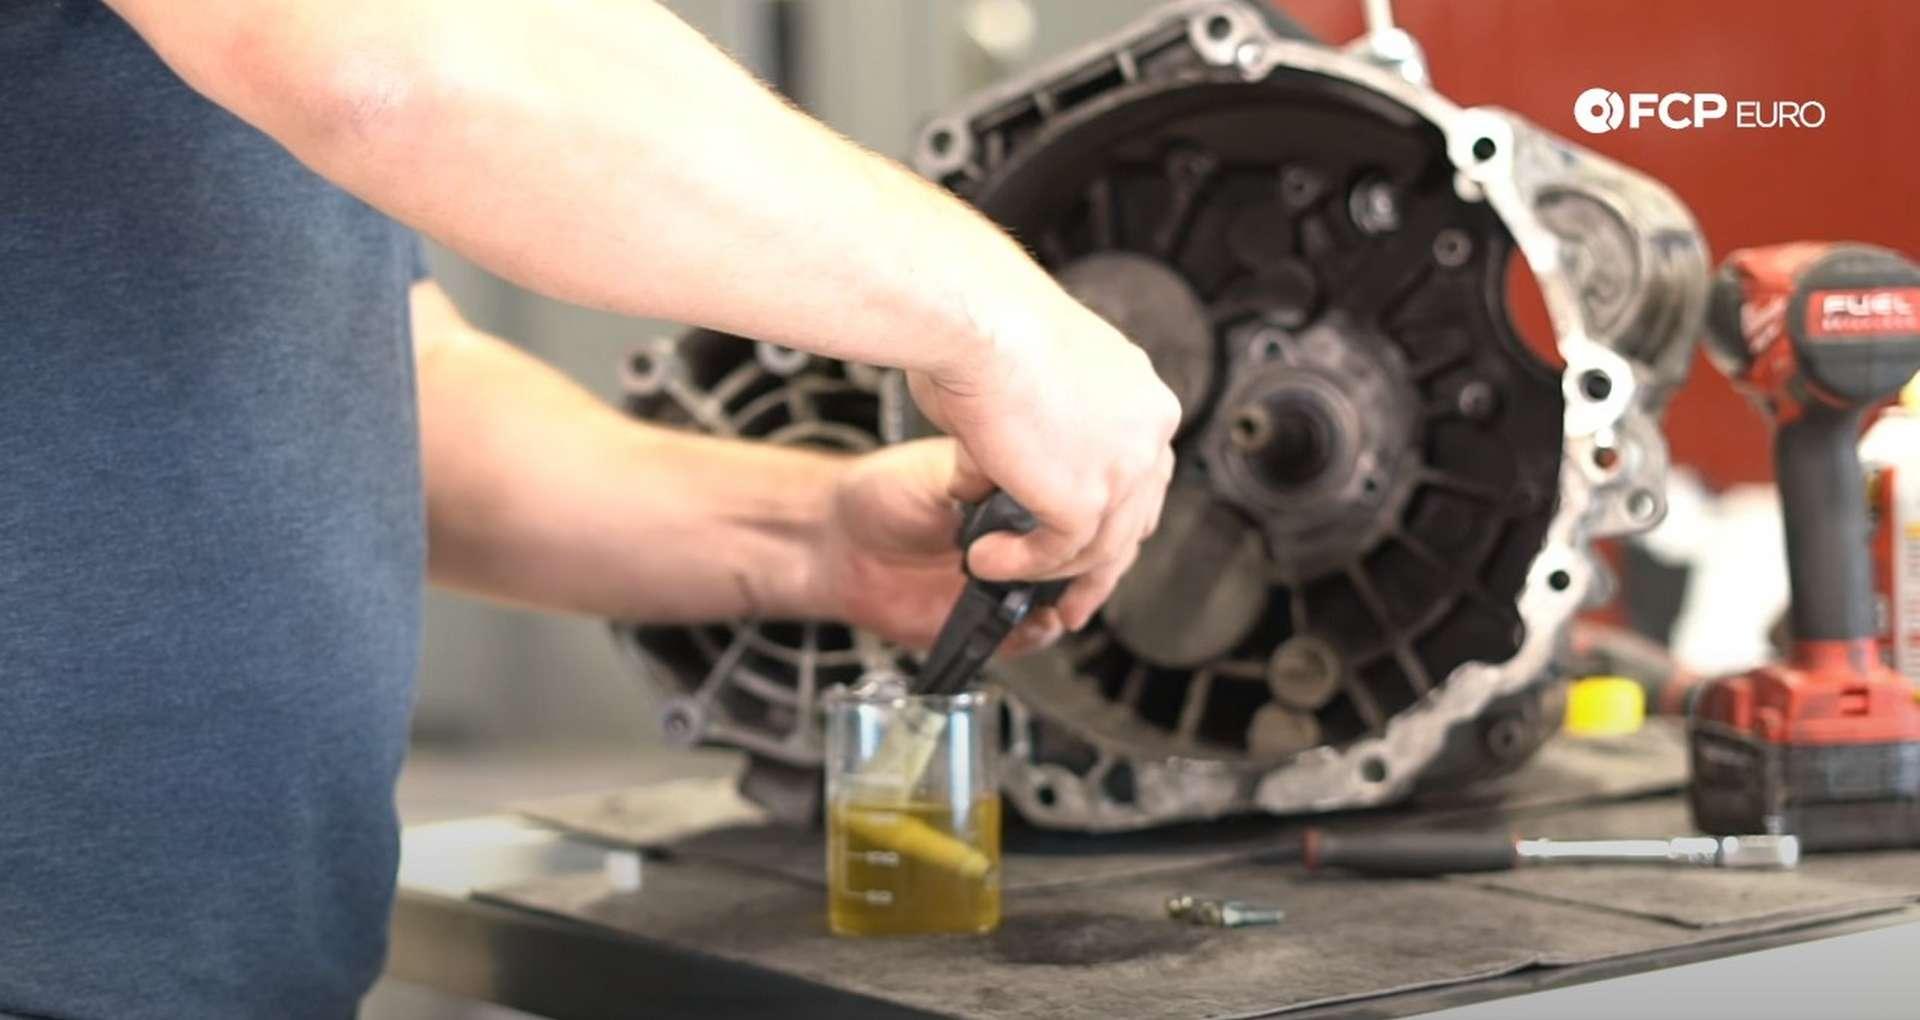 50-DIY_VW_GTI_Clutch-Job-Replacing-Throwout-Bearing